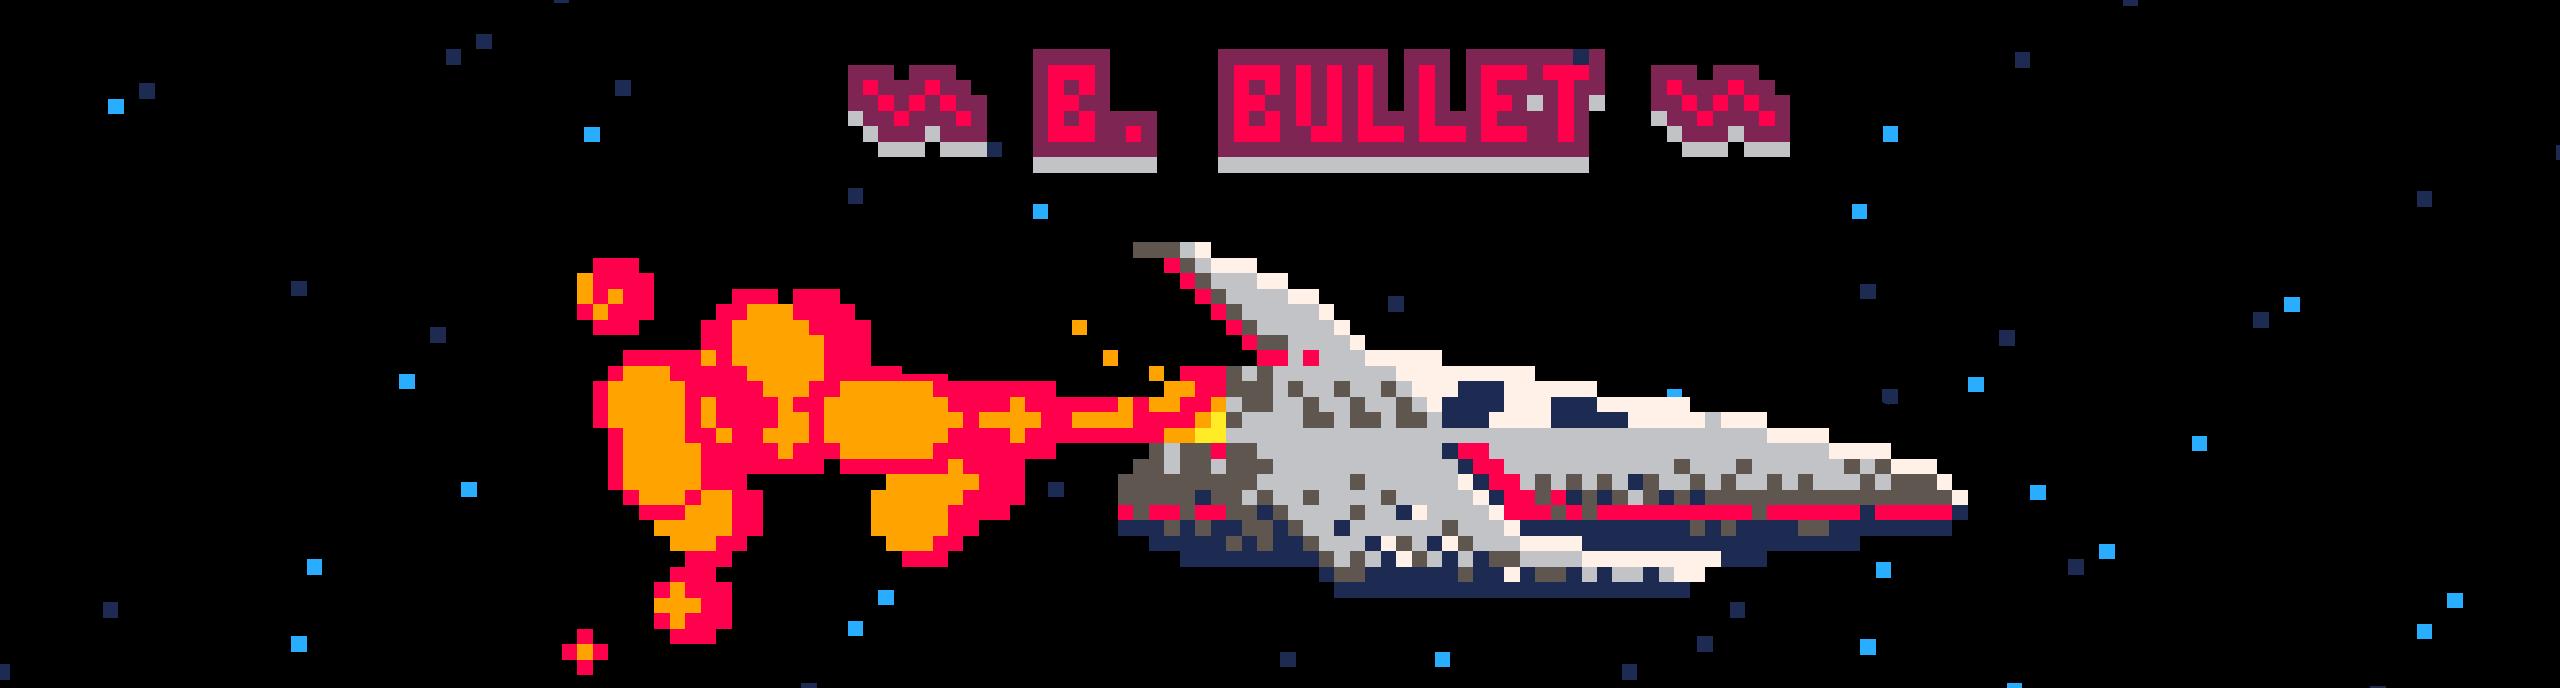 BBullet 0.92 (Fantasy Console Jam #2)